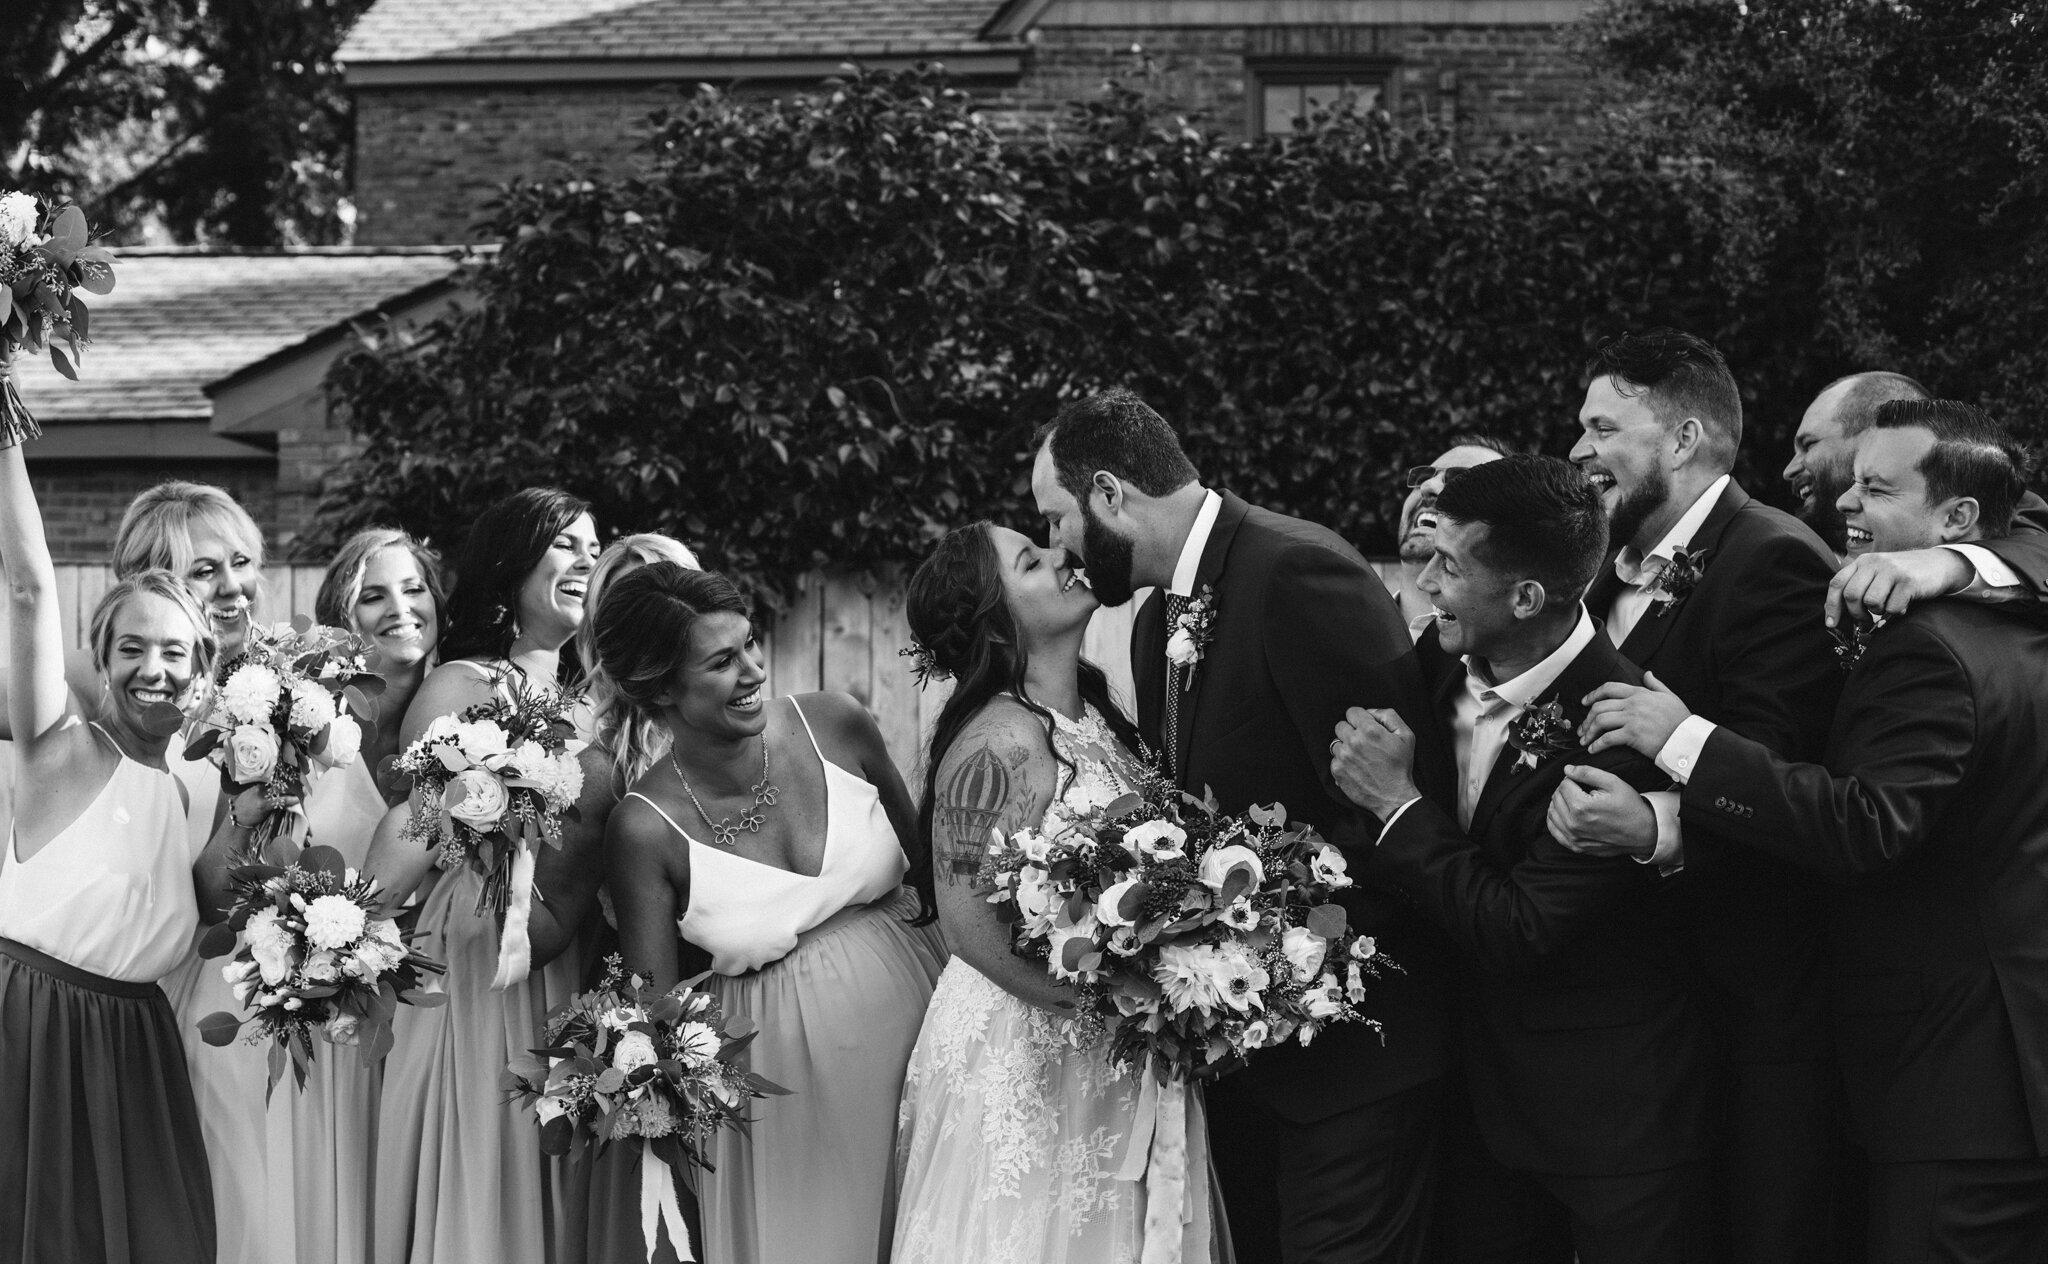 angela_jason_norfolk_wedding-66.jpg